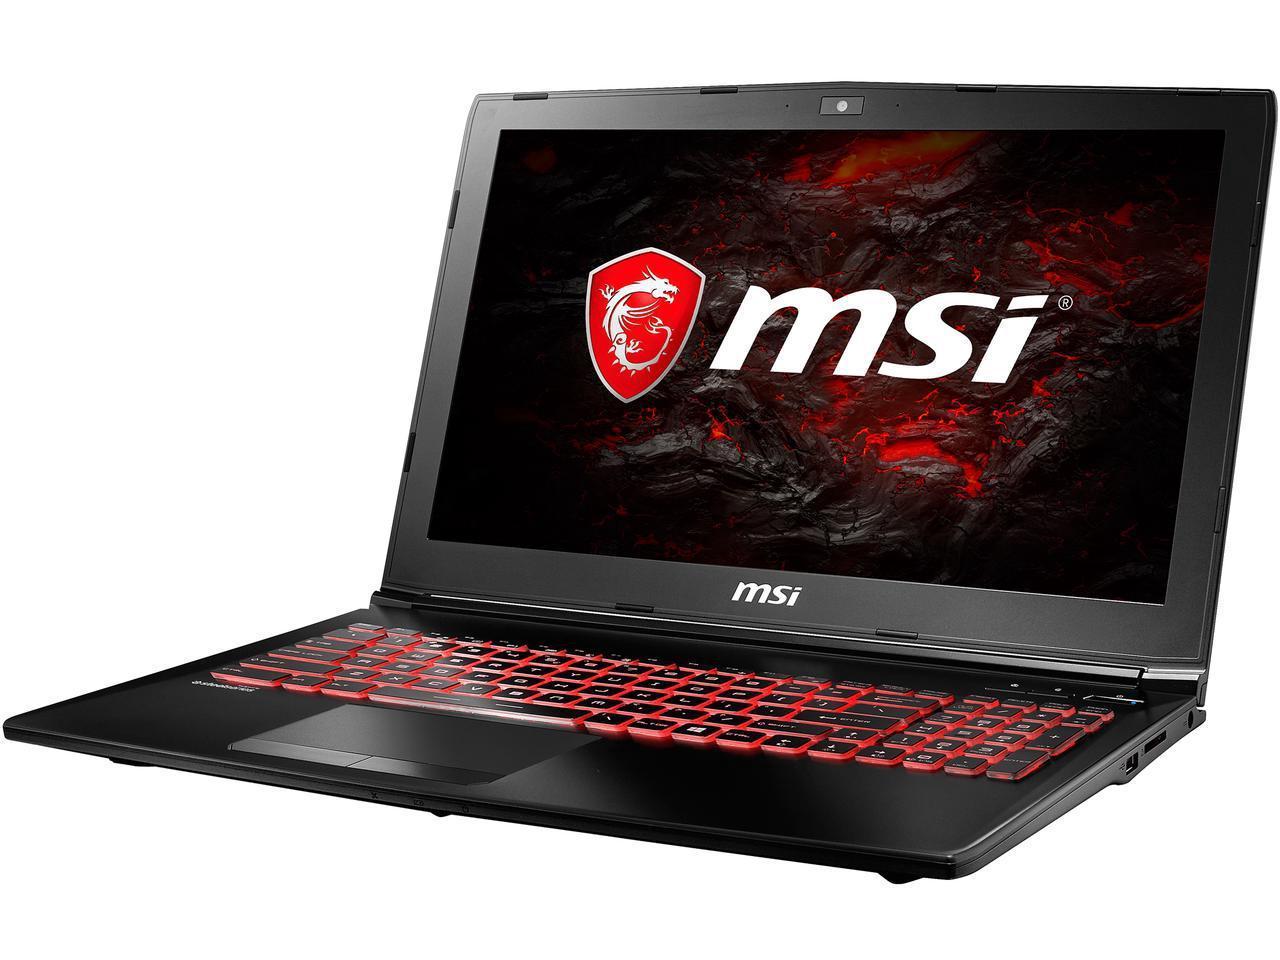 MSI GL62M 7RDX-NE1050i5 laptop: 15.6'' FHD, i5-7300HQ, 8GB DDR4, 1TB HDD, GTX 1050 2GB, Type-C, WIn10H @ $599 AR + F/S